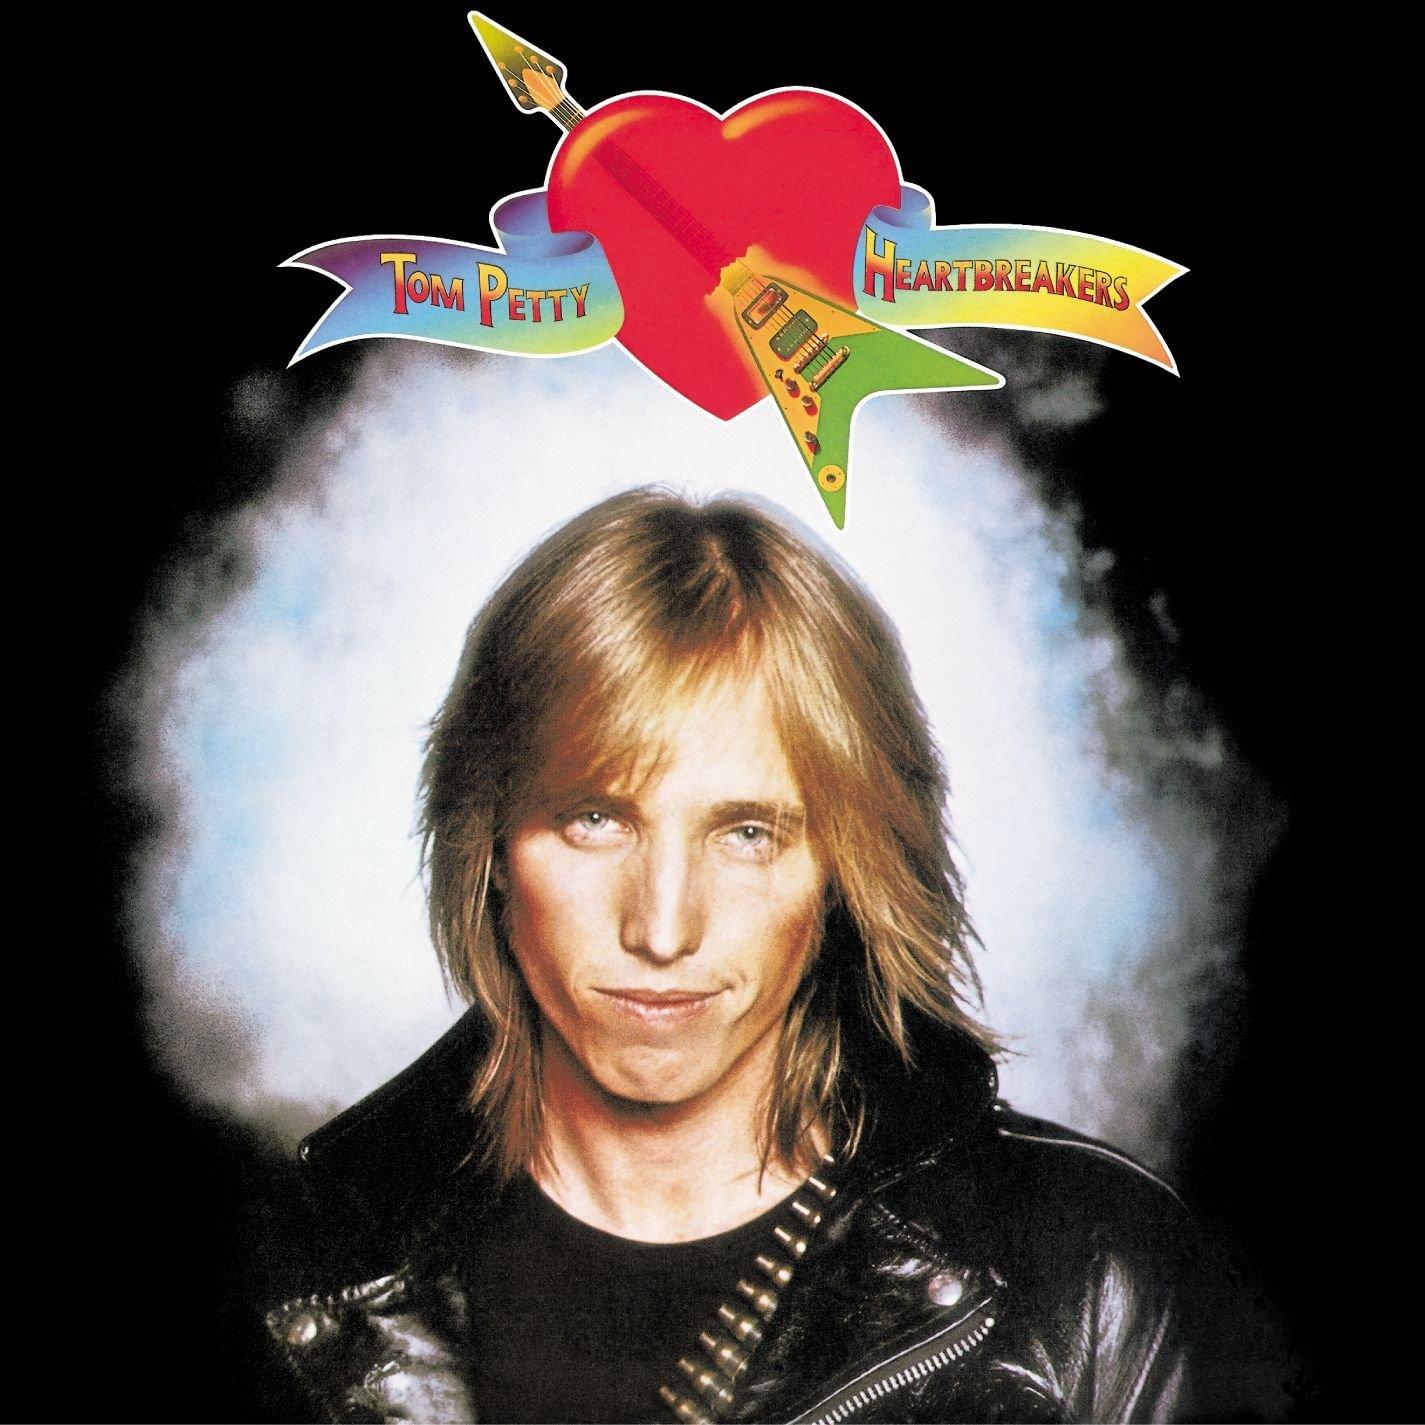 Tom Petty & the Heartbreakers, 'American Girl'